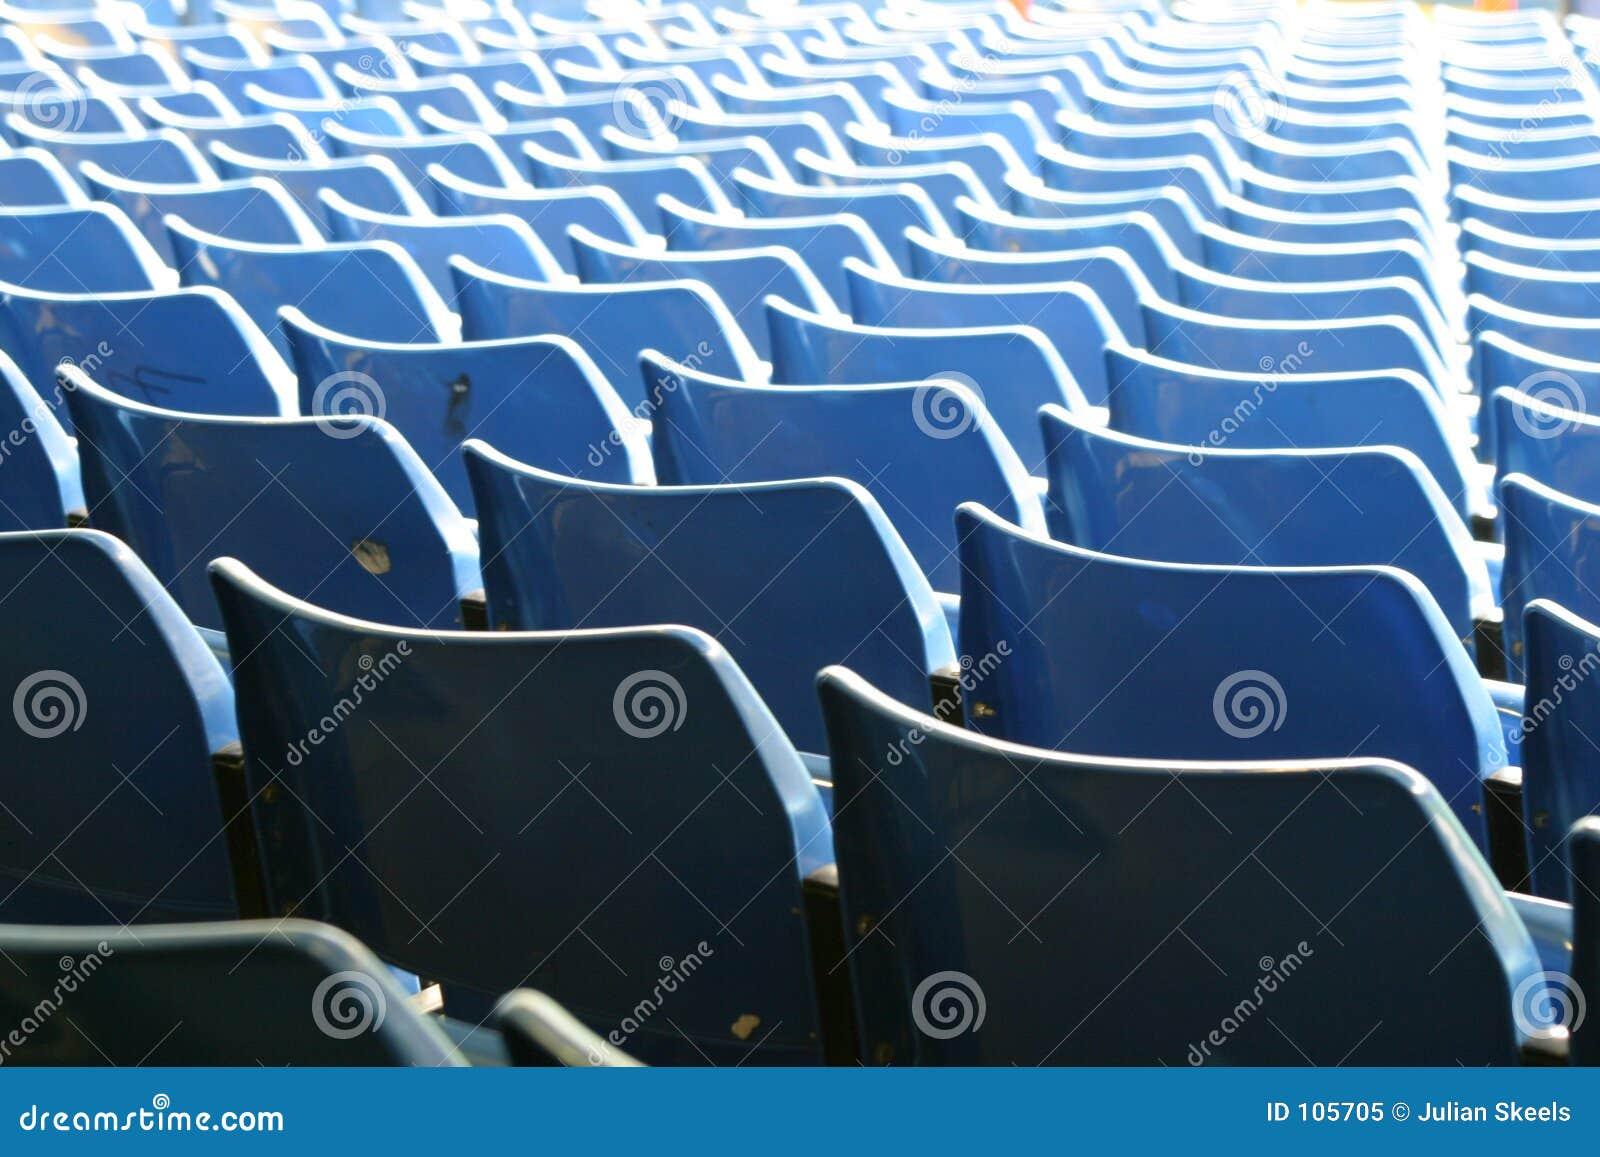 Football seats 2